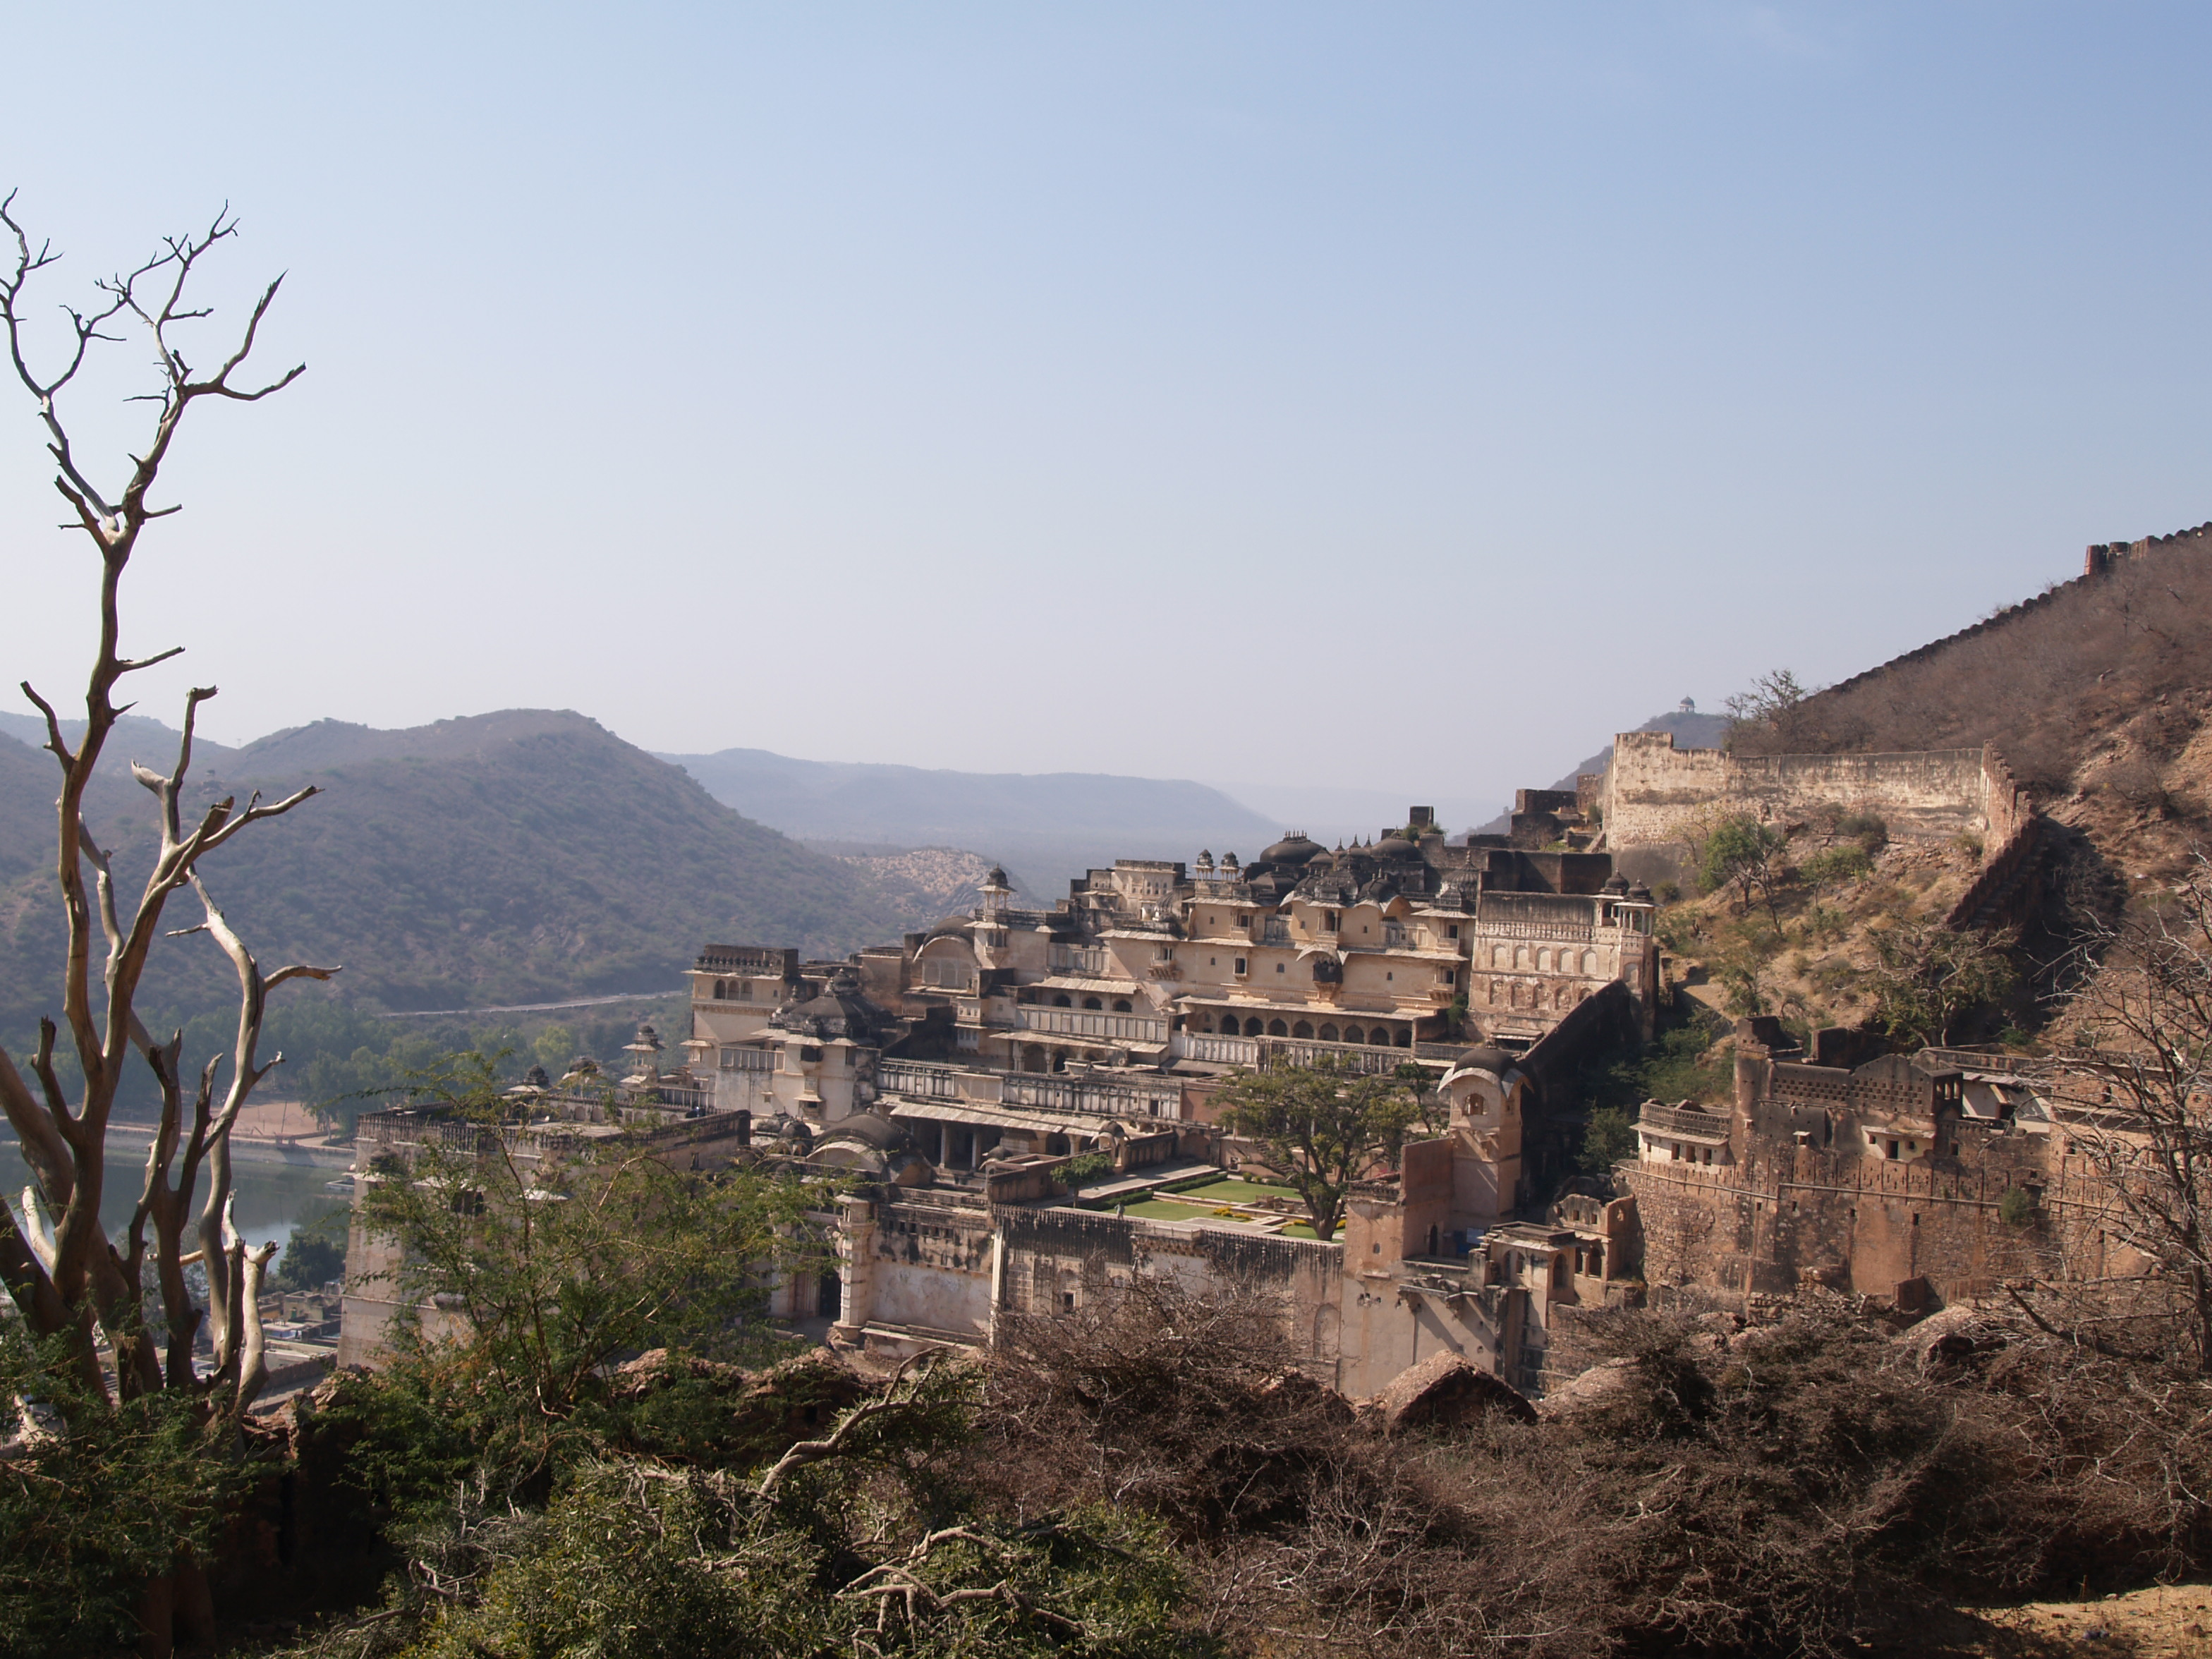 P1181657_V2007_Fav_India_Rajastan_Bundi